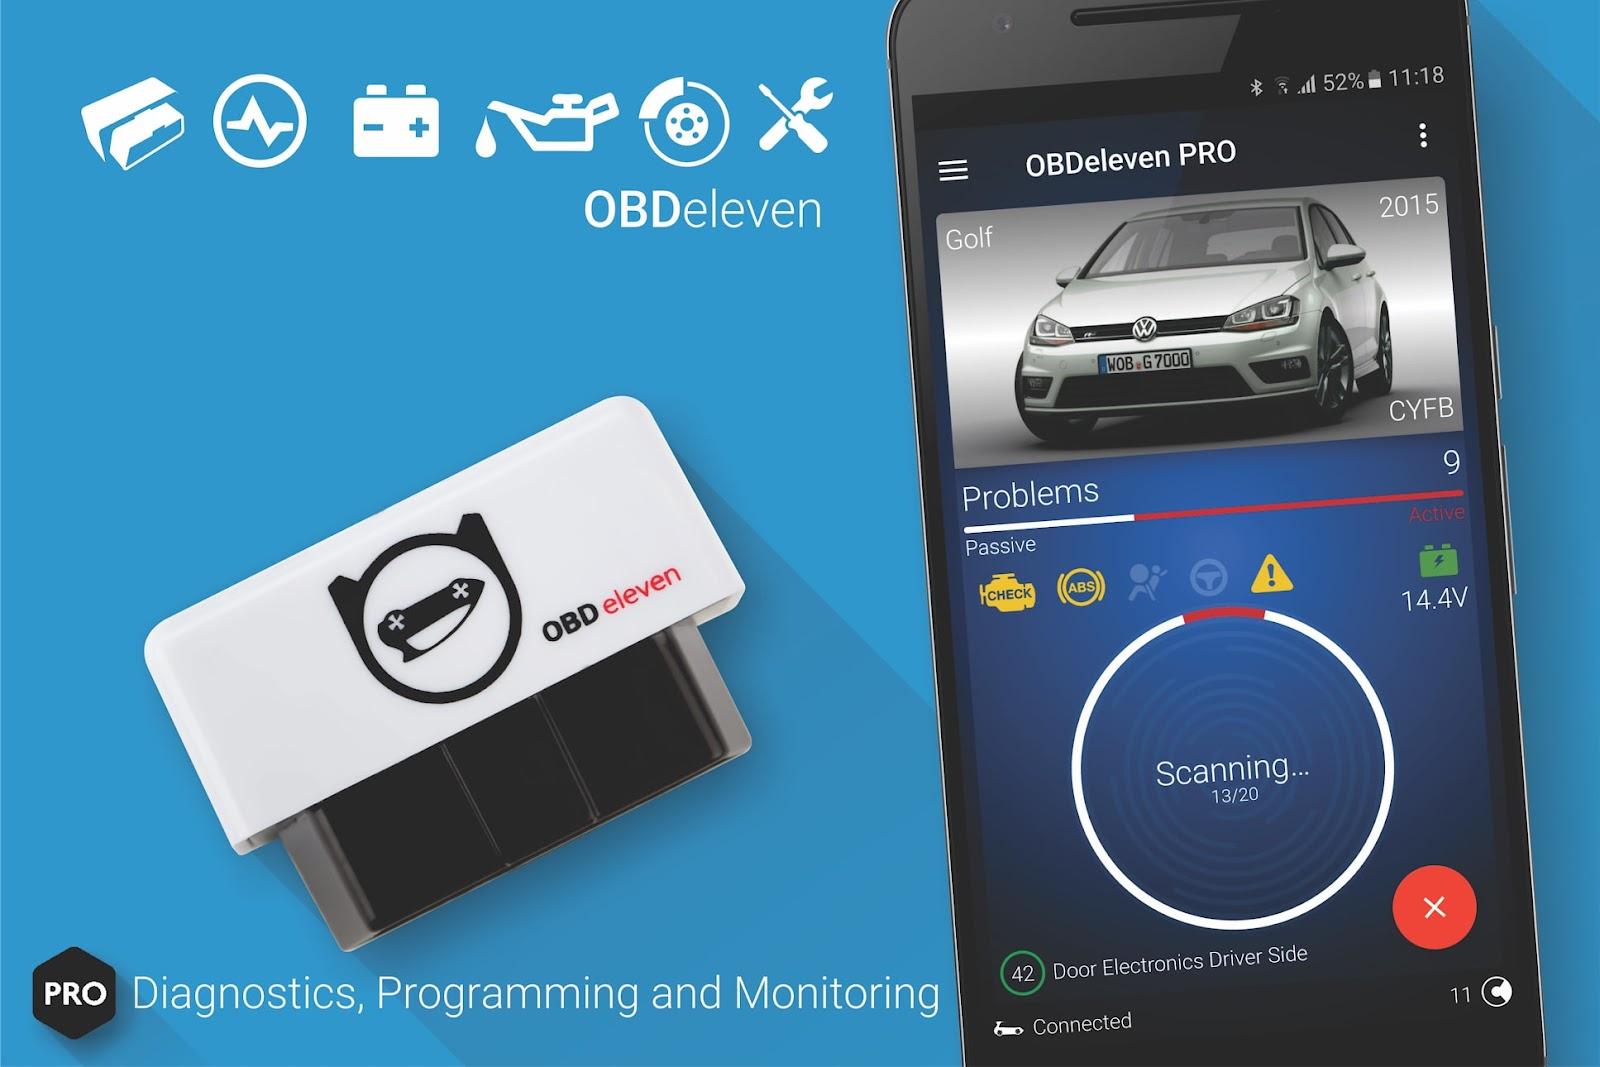 Best OBD2 apps, OBD2 apps, car diagnostic tool, OBD Eleven